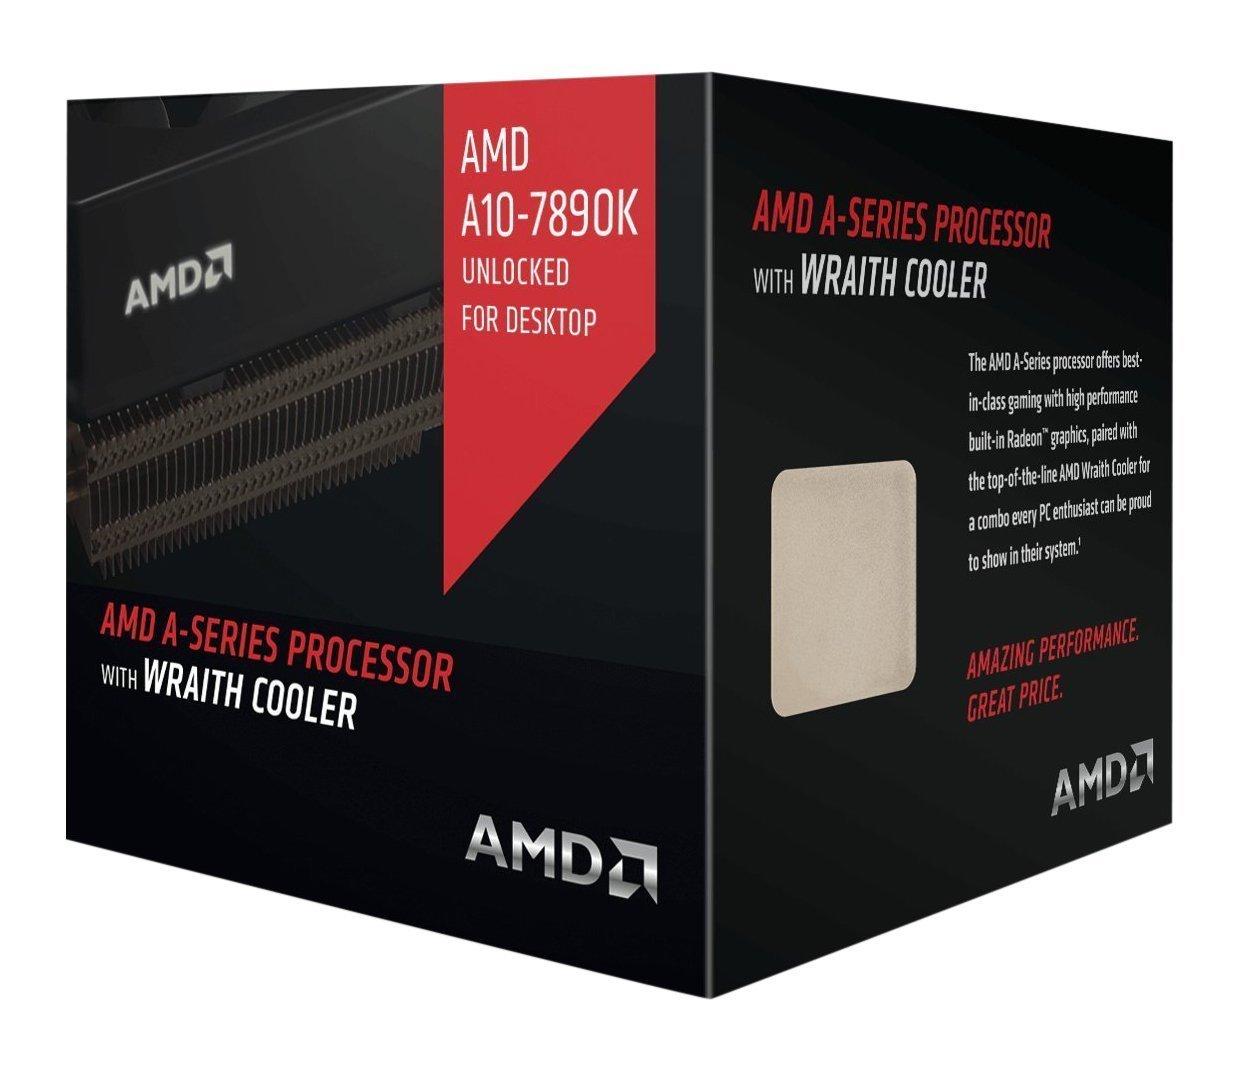 ASRock FM2A88M Pro3+ AMD Cool and Quiet Driver Windows 7